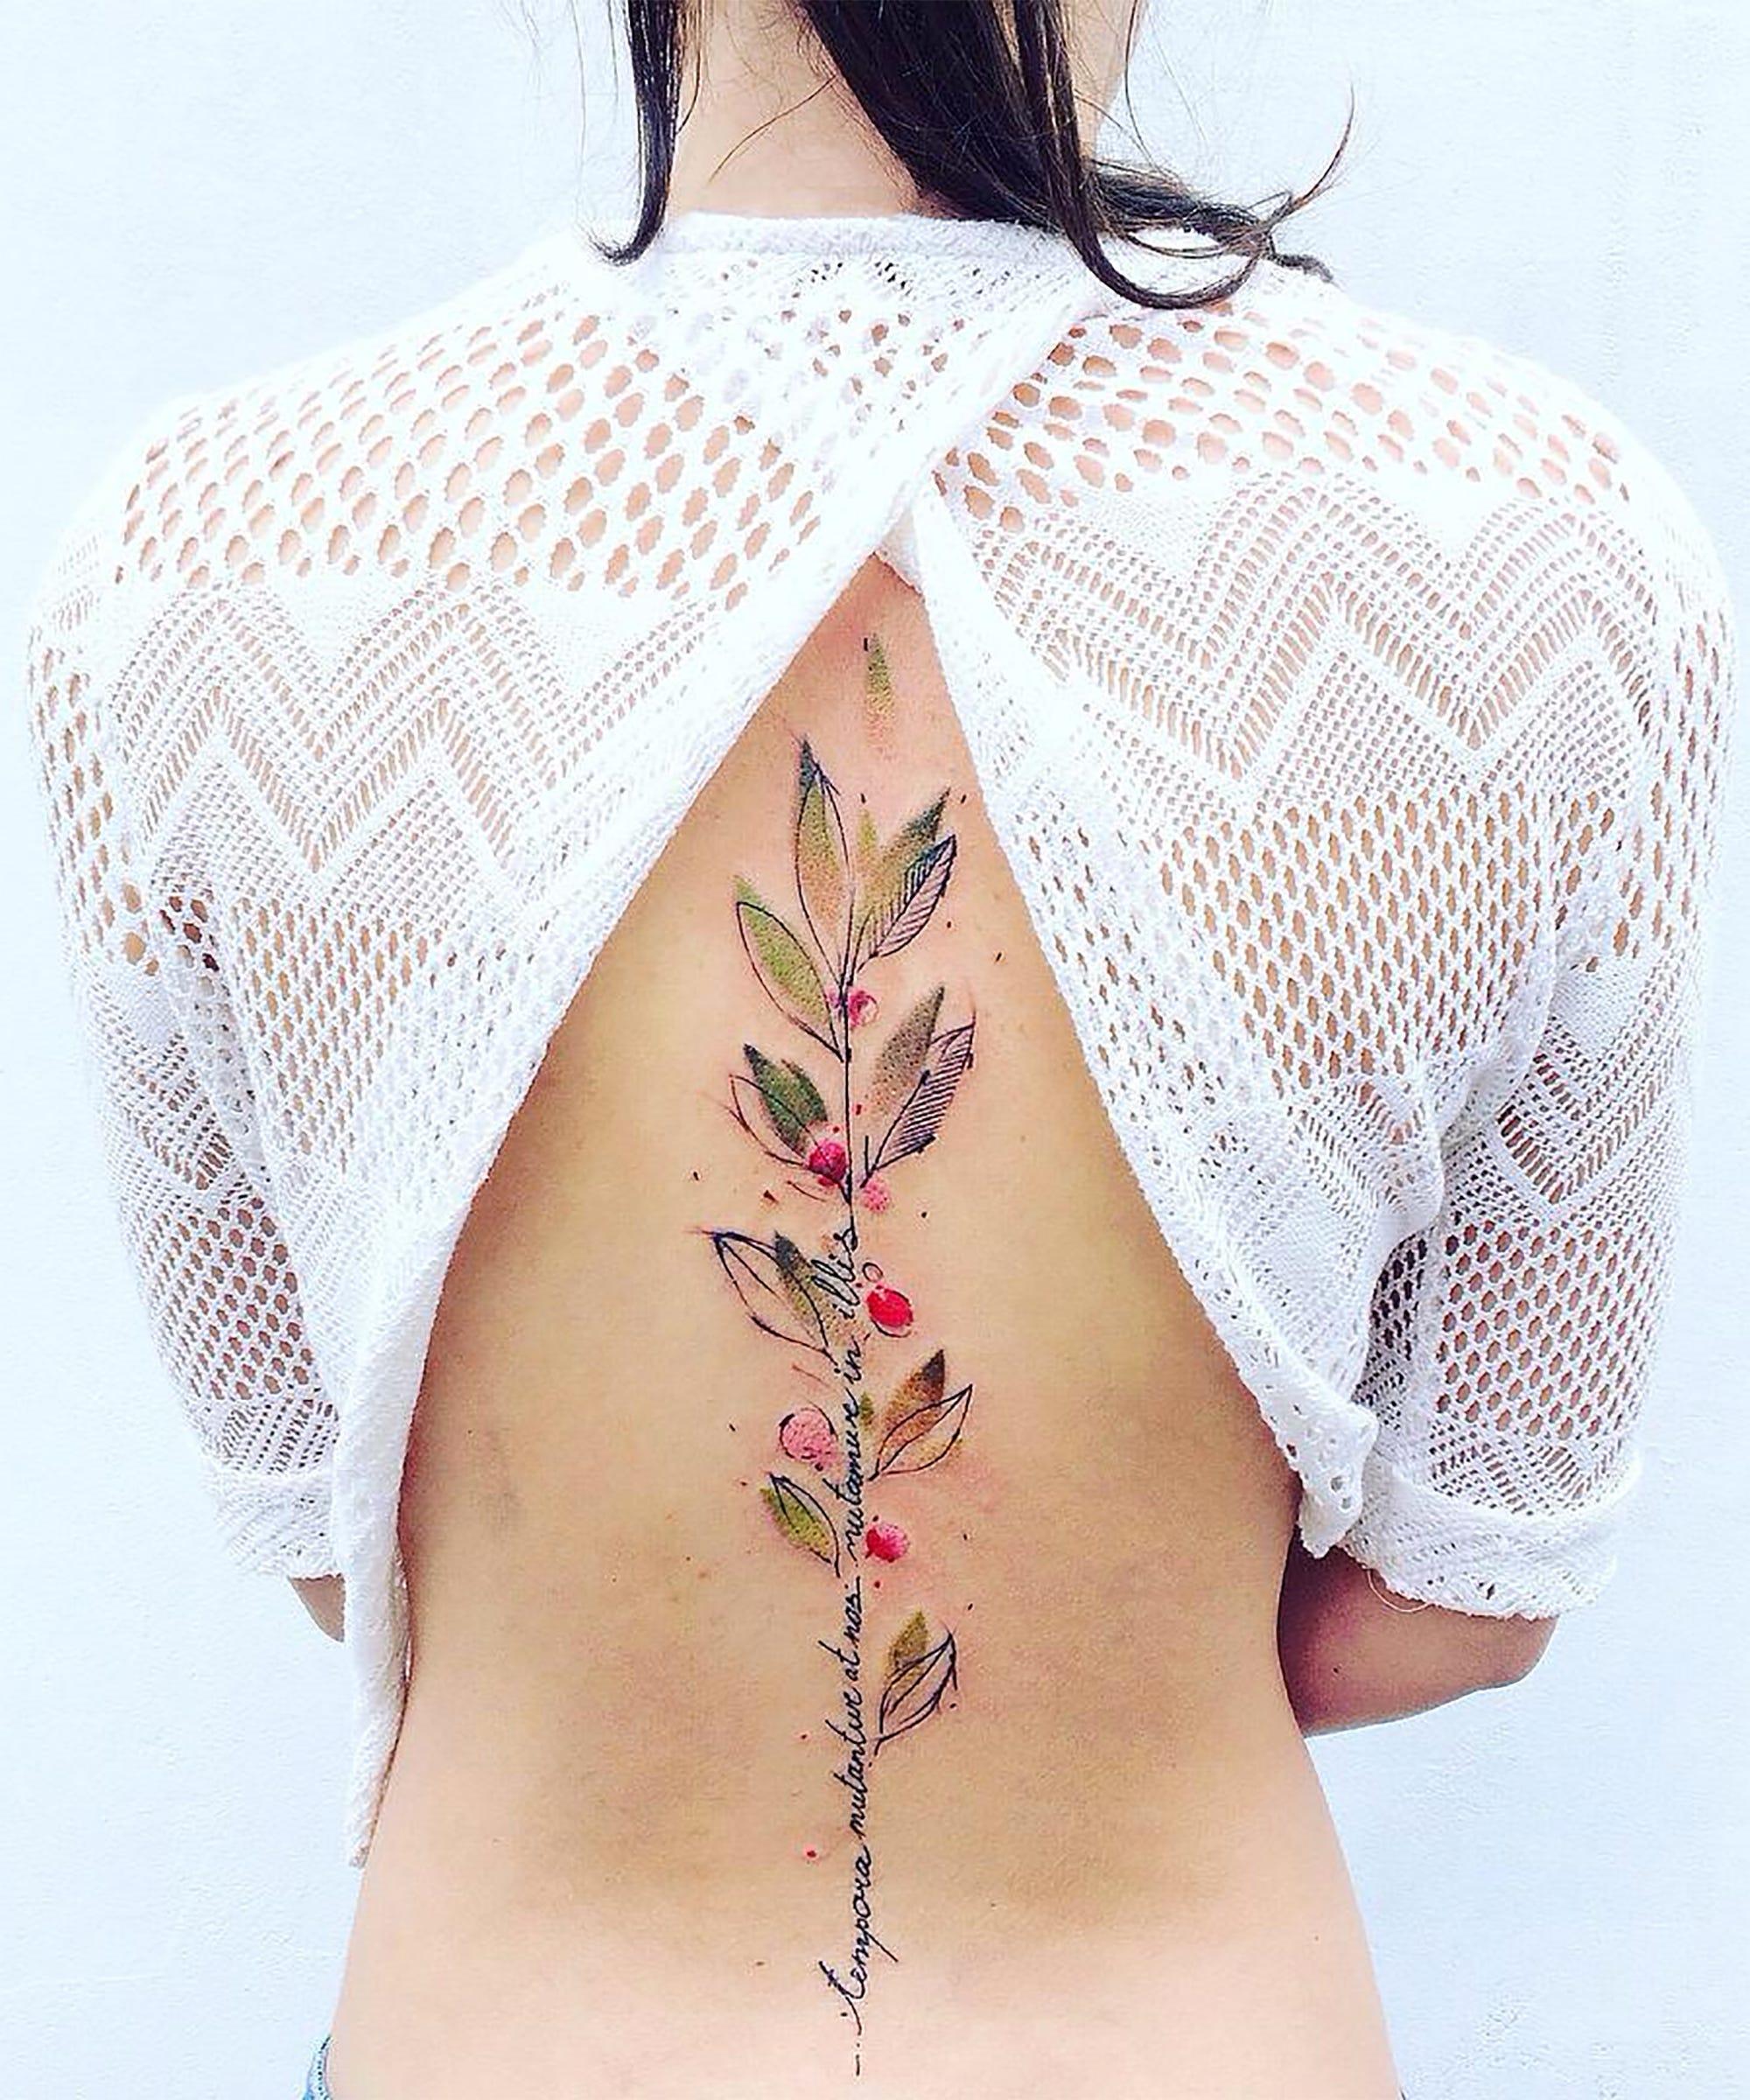 eb85967e06e6a Watercolor Tattoos That Are Perfect For Spring Designs